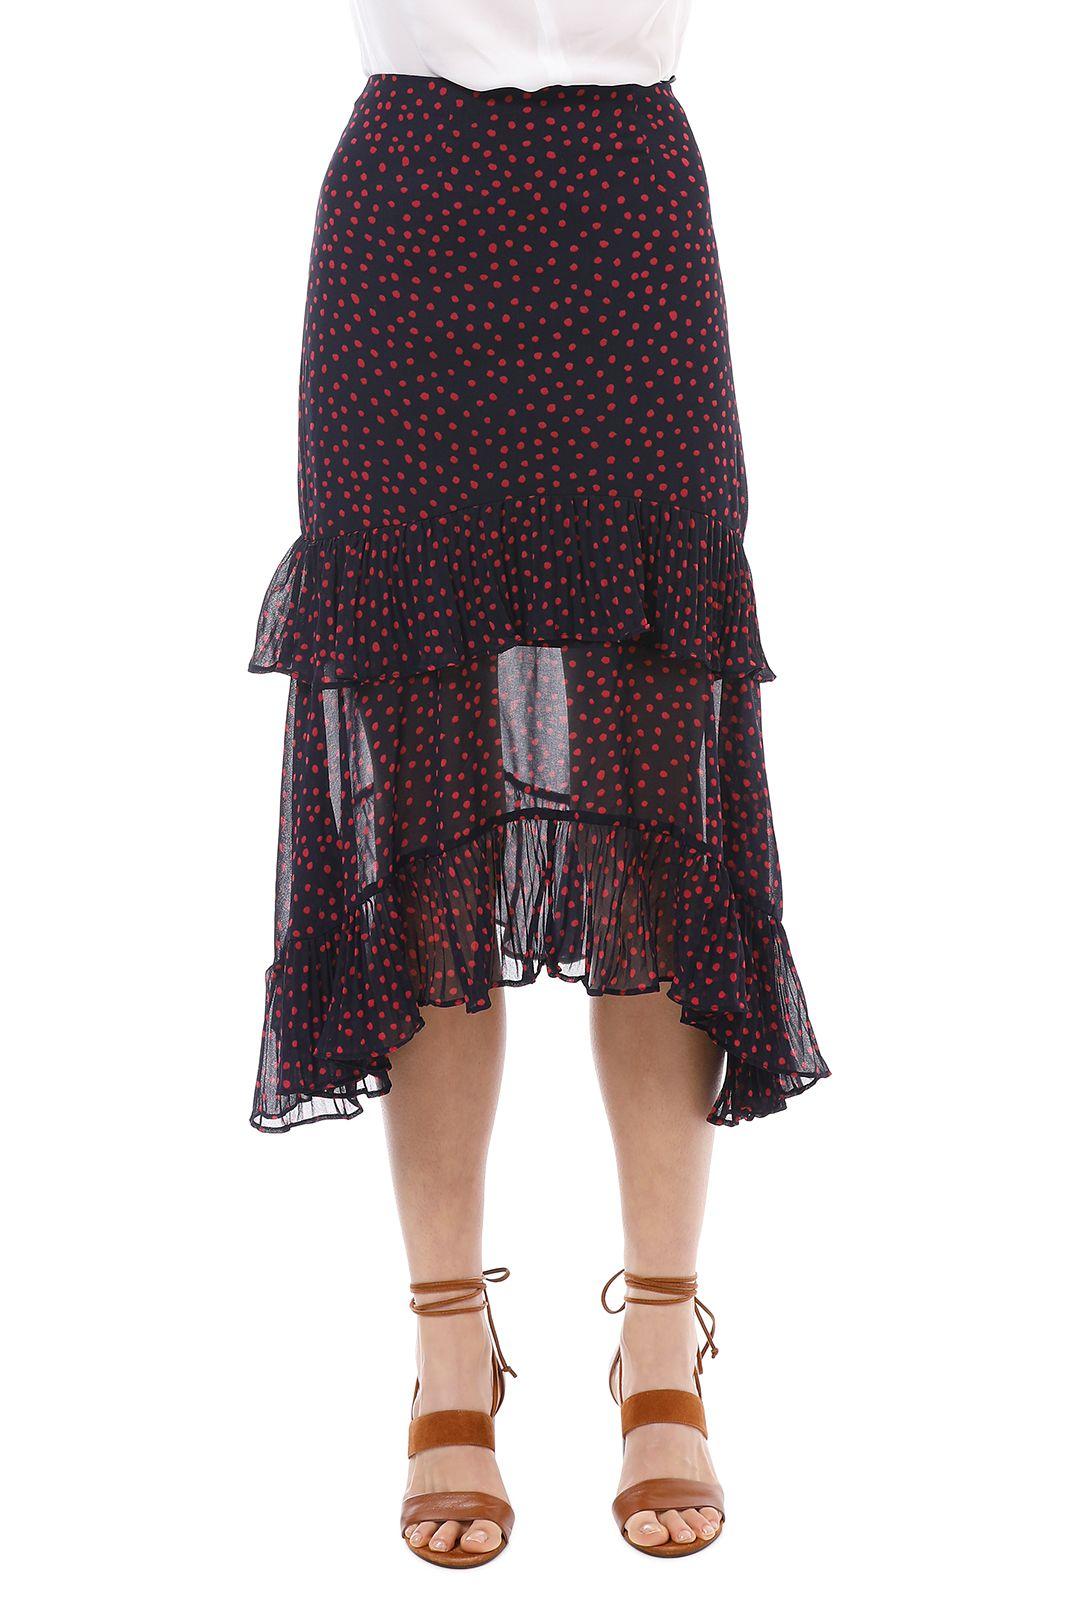 Keepsake the Label - Moonshine Skirt - Print - Front Detail